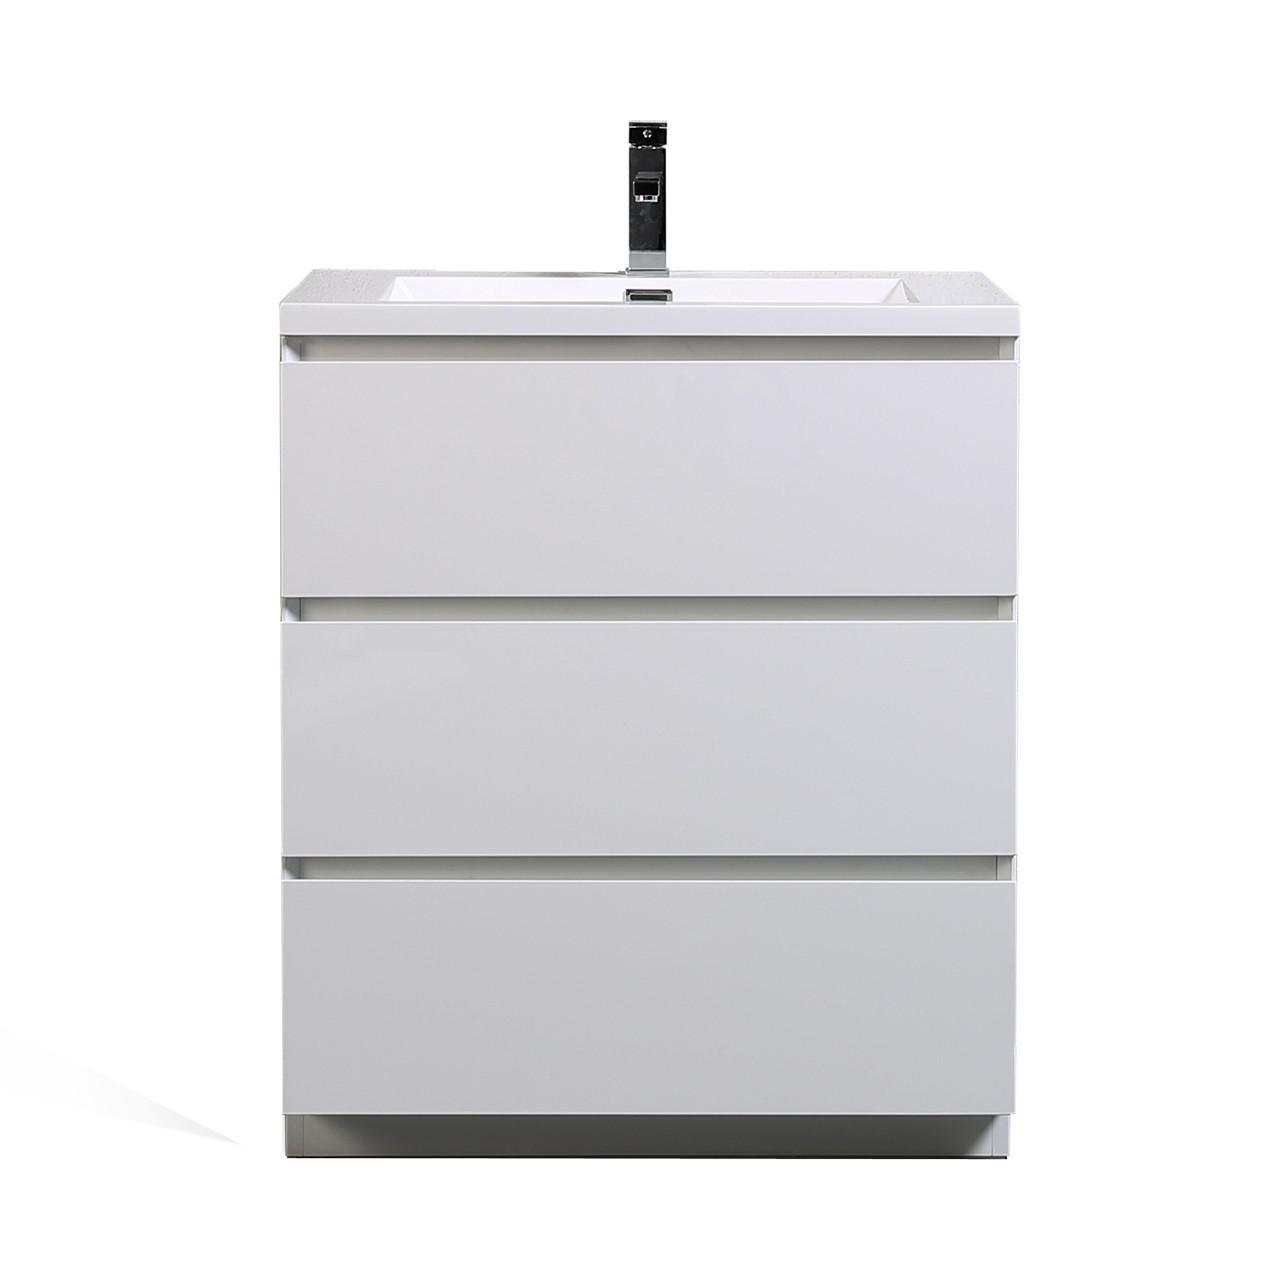 Moa 30 Gloss White Modern Bathroom Vanity W 3 Drawers And Acrylic Sink Los Angeles Vanity